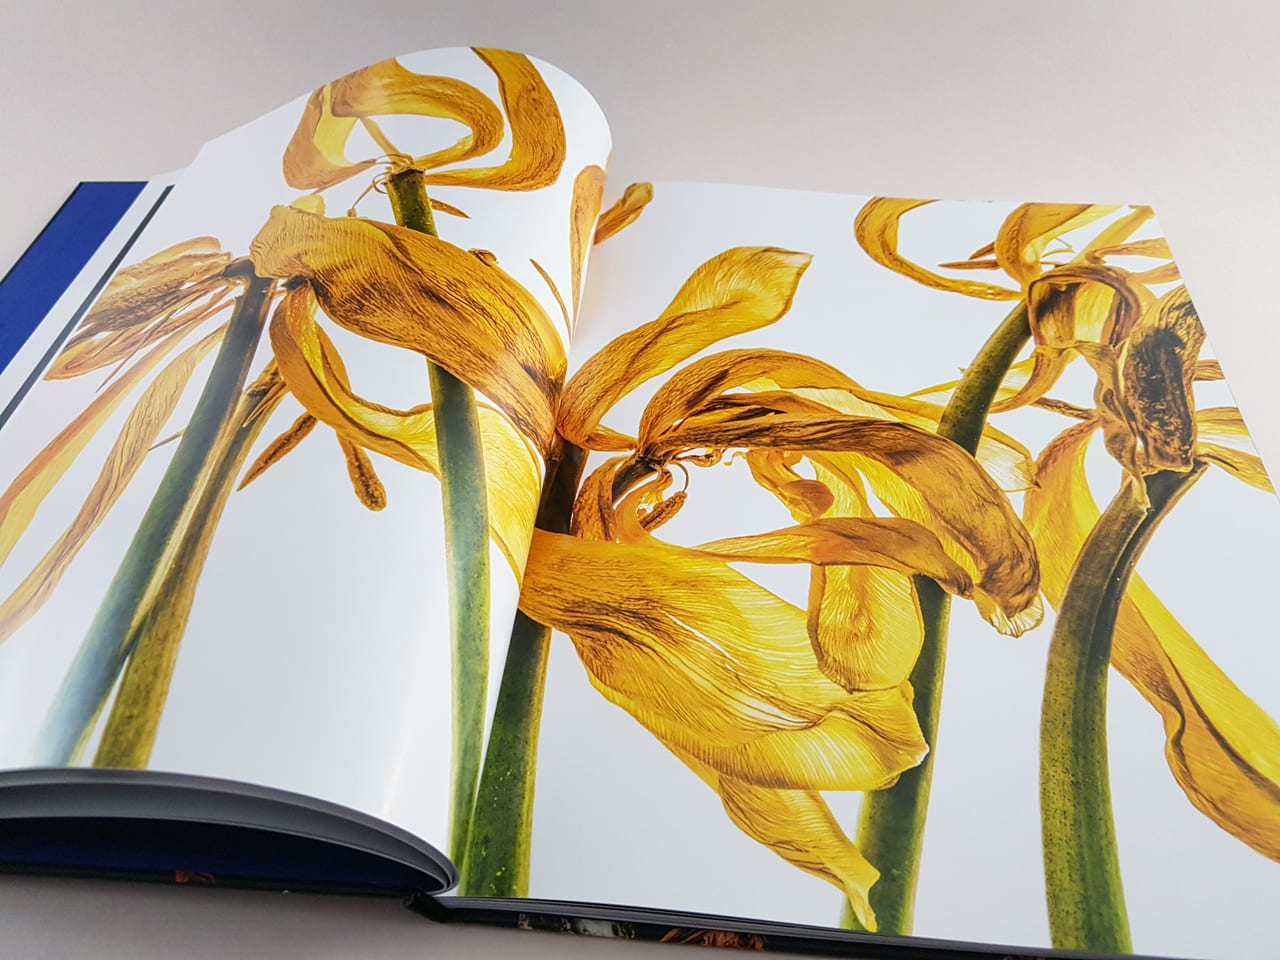 Fading Beauty Kerber Verlag aufgeschlagener Bildband